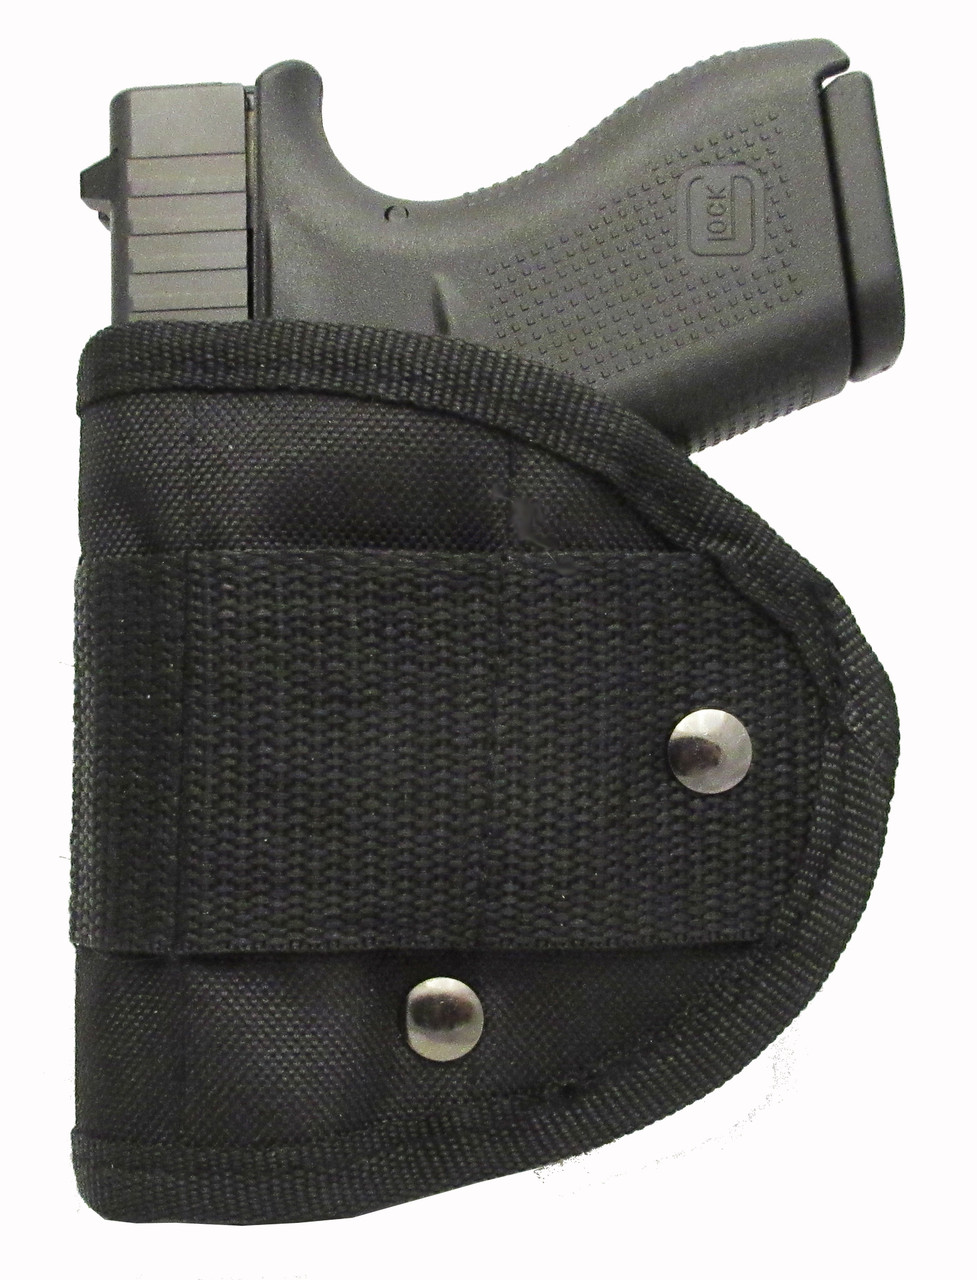 Inside Waistband Poly Sling Holster Fits Glock 42 IWB (M1)